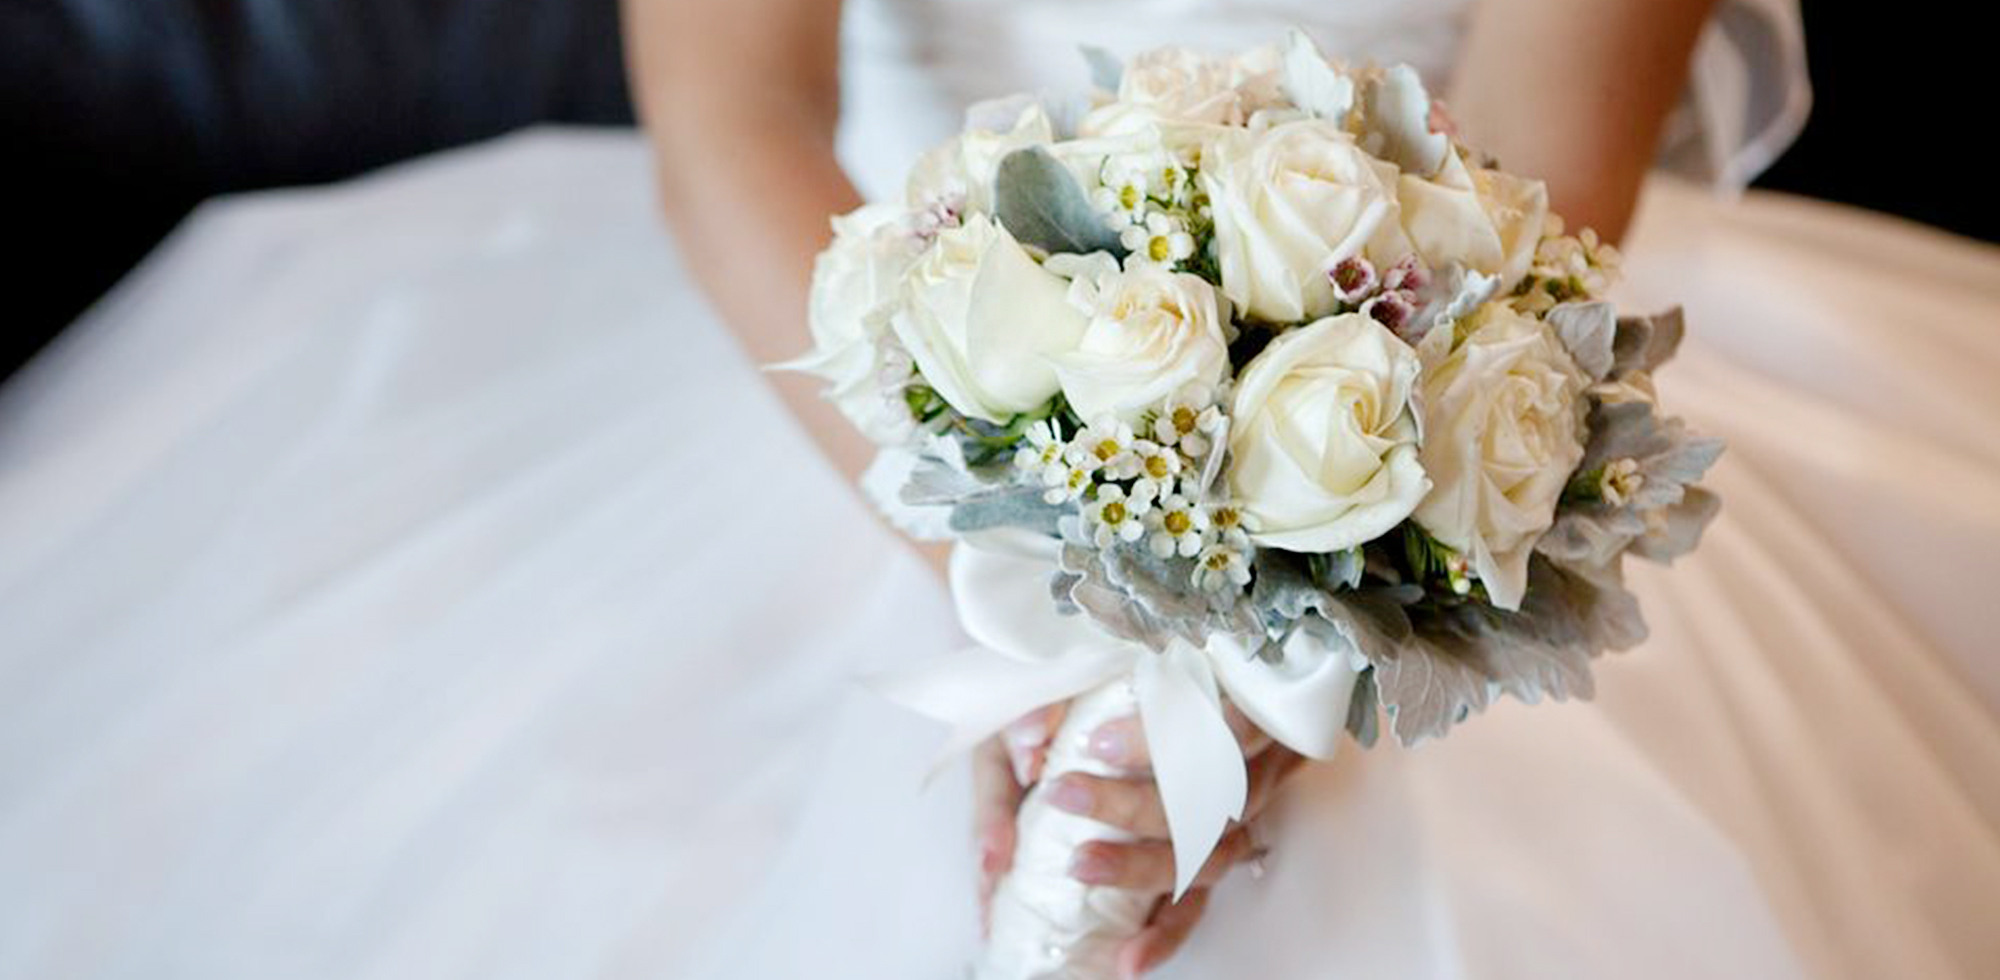 Vistana Penang Bukit Jambul Penang Wedding Venue Weddings